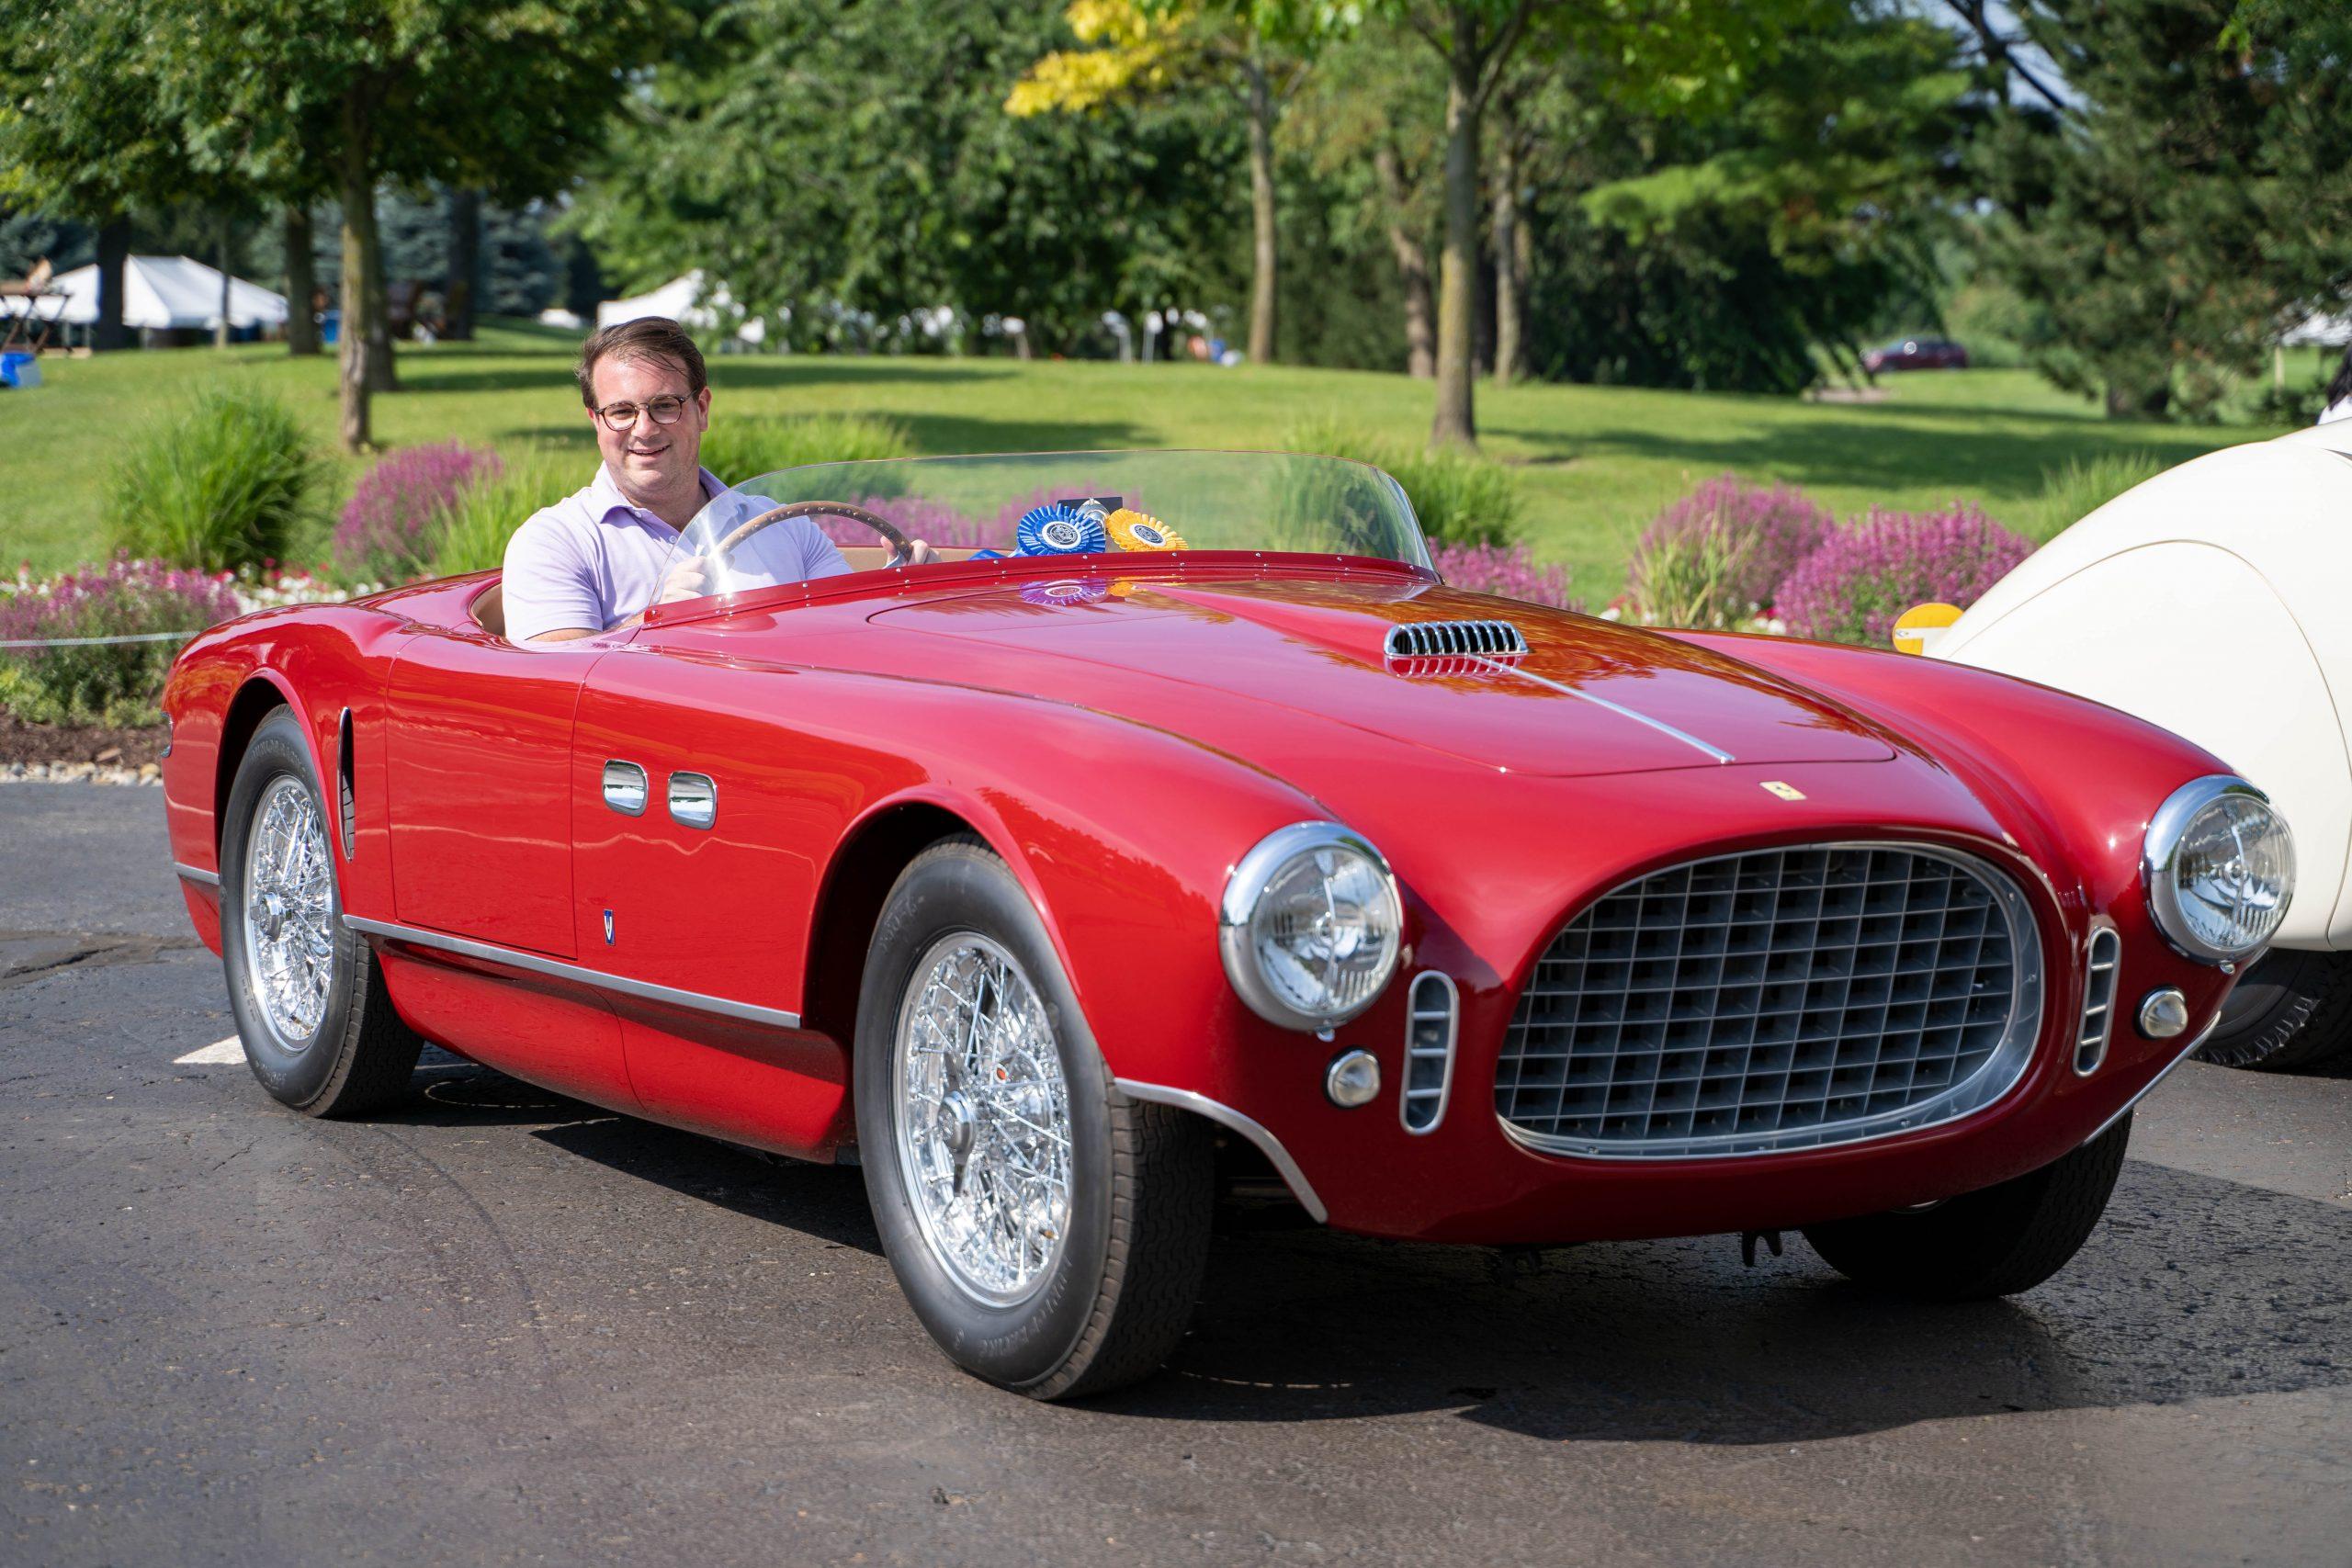 2021 COA Best of Show 1953 Ferrari 250MM and owner